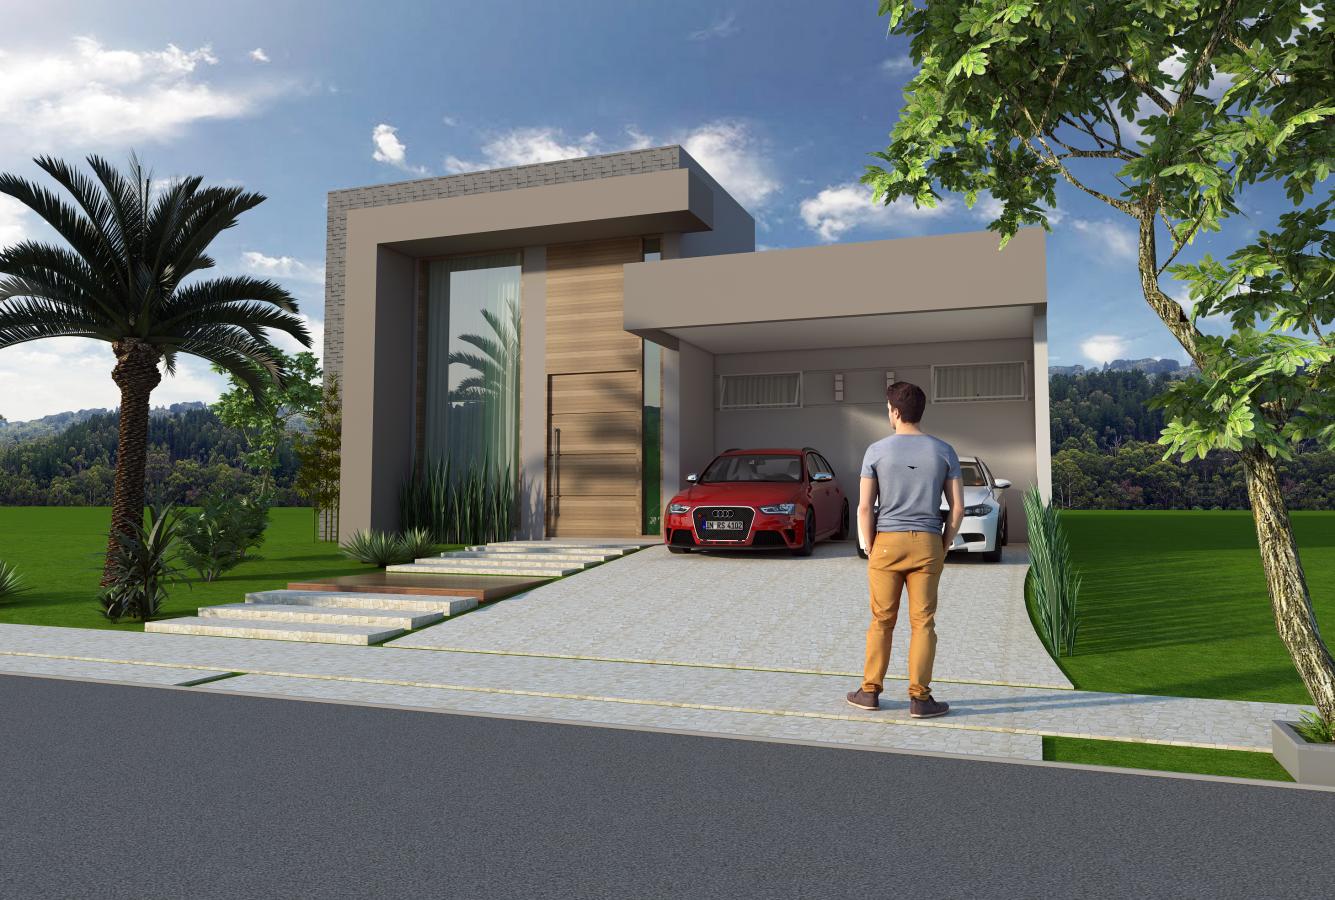 Projeto 140m2 casa t rrea fachada moderna linhas retas pedireito alto terreno 10 25 condominio - Progettare casa 3d gratis ...